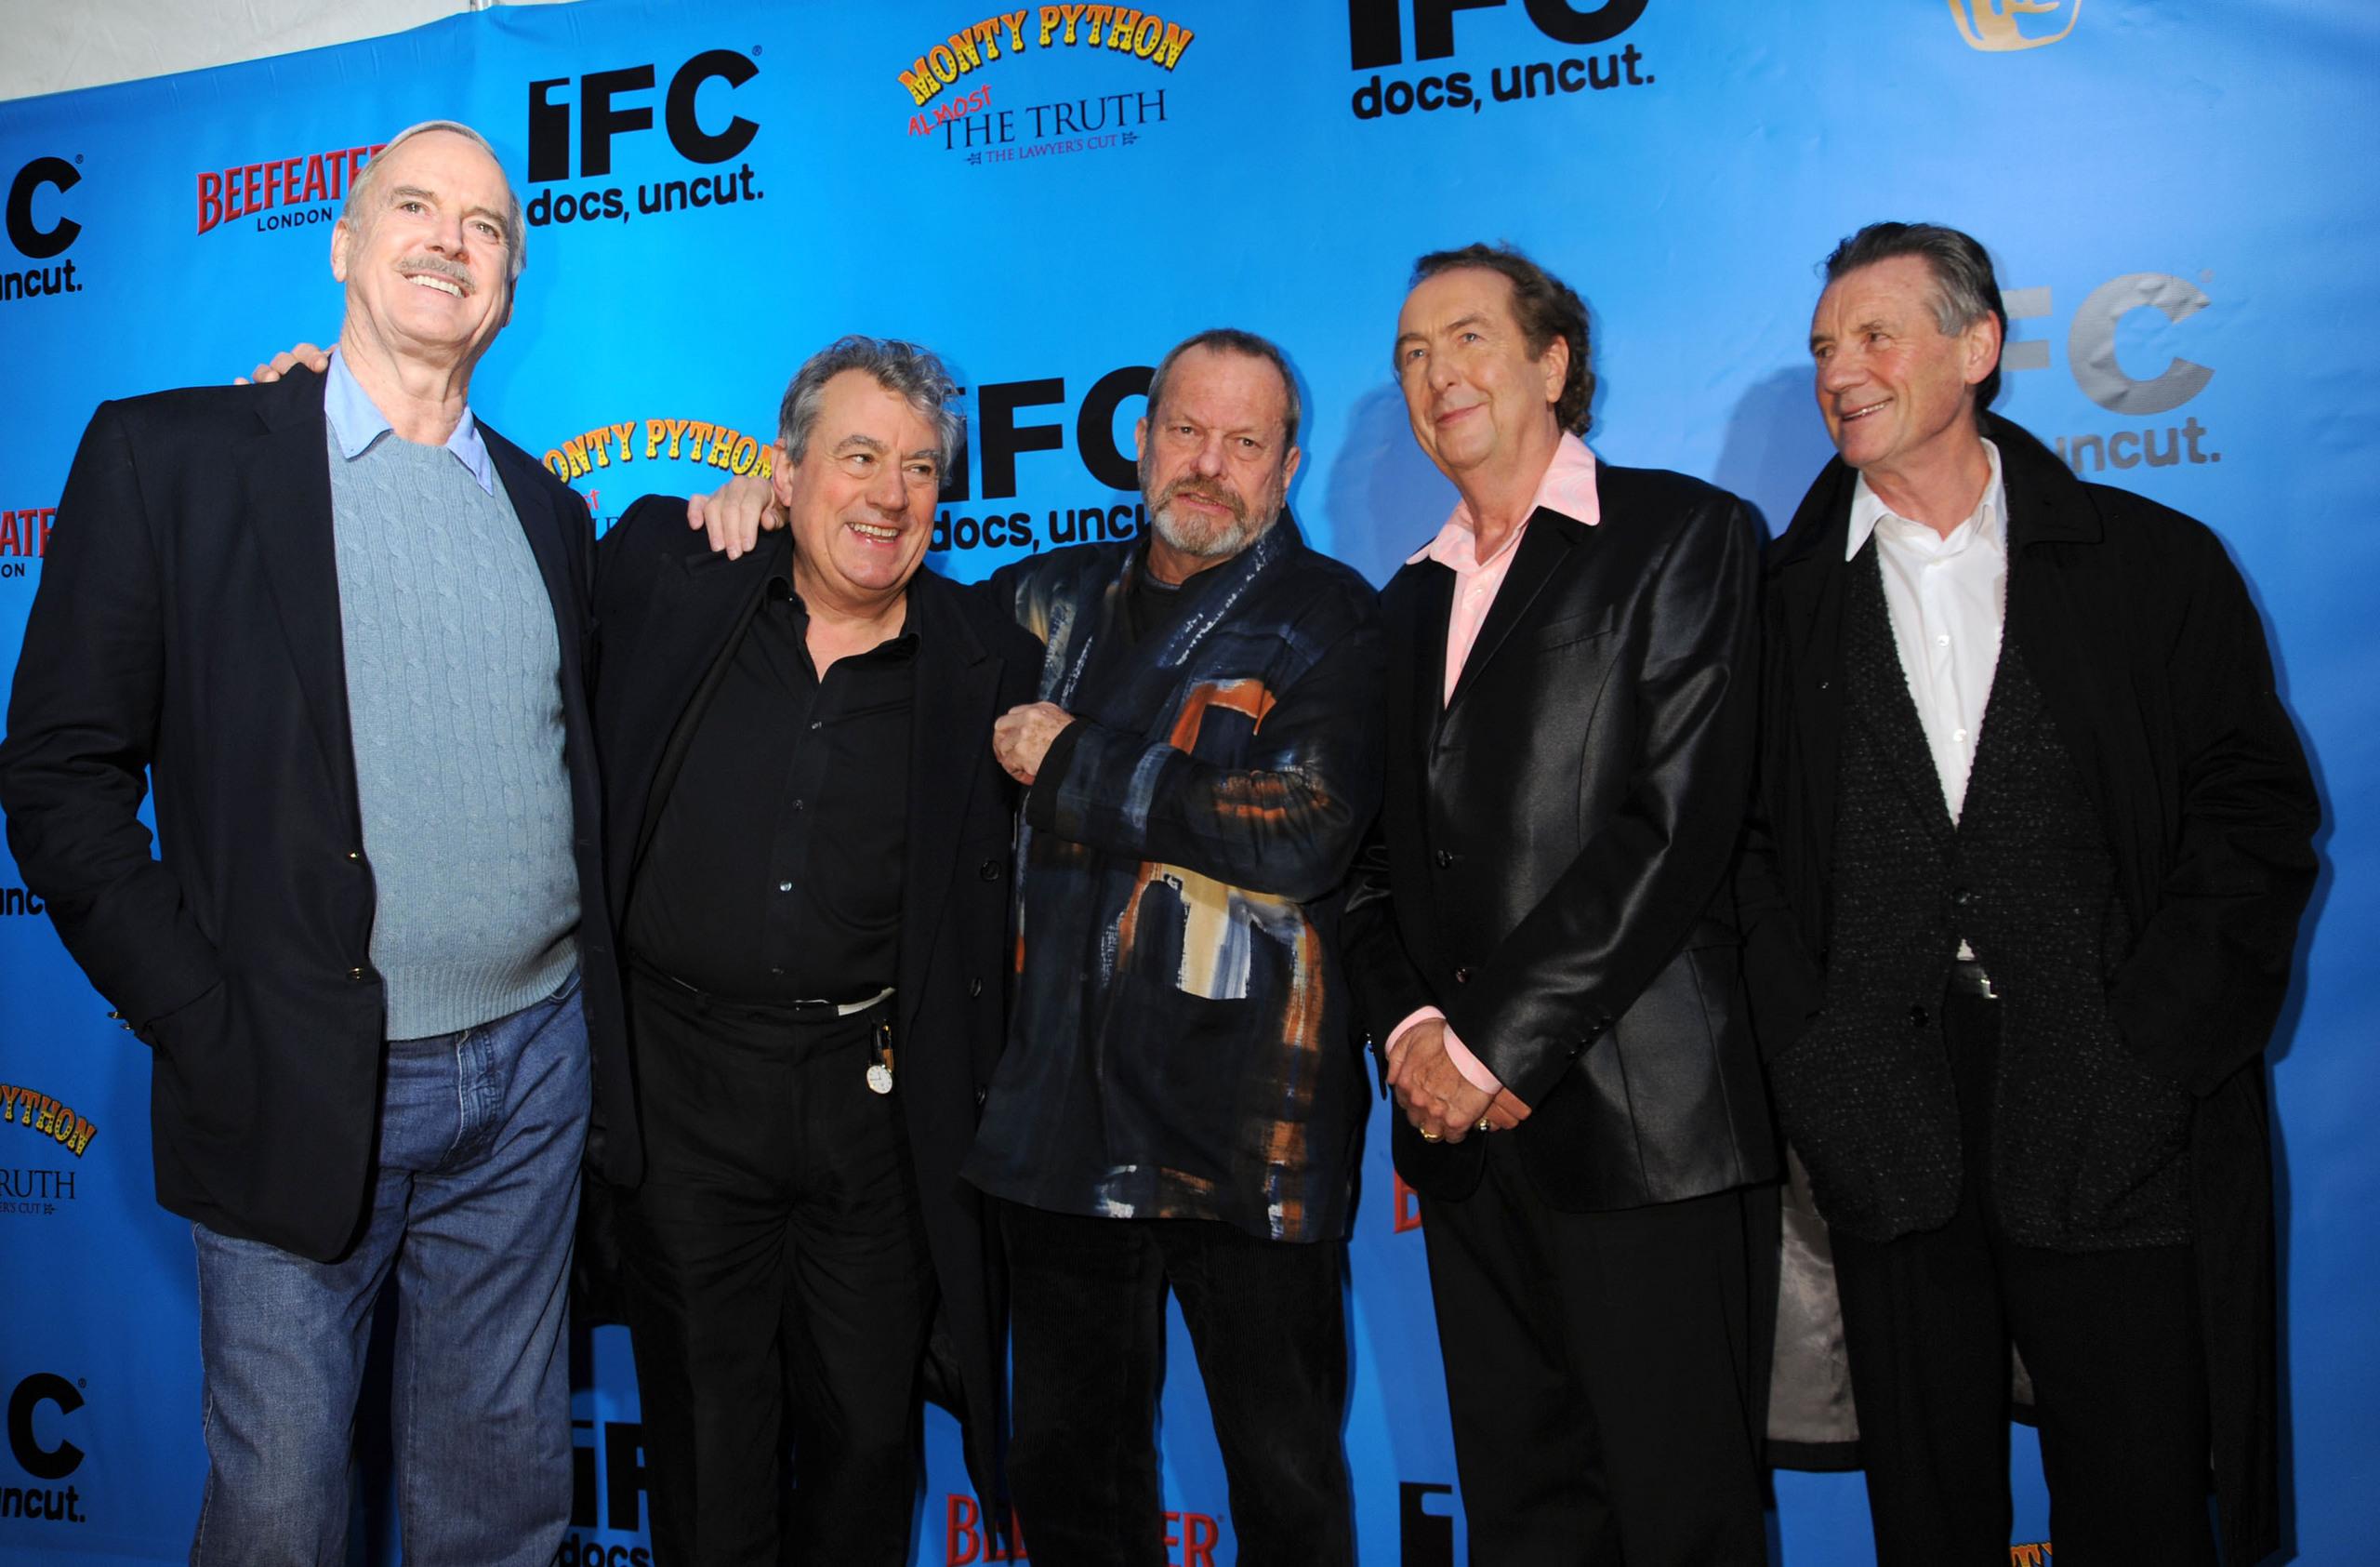 Old Monty Python